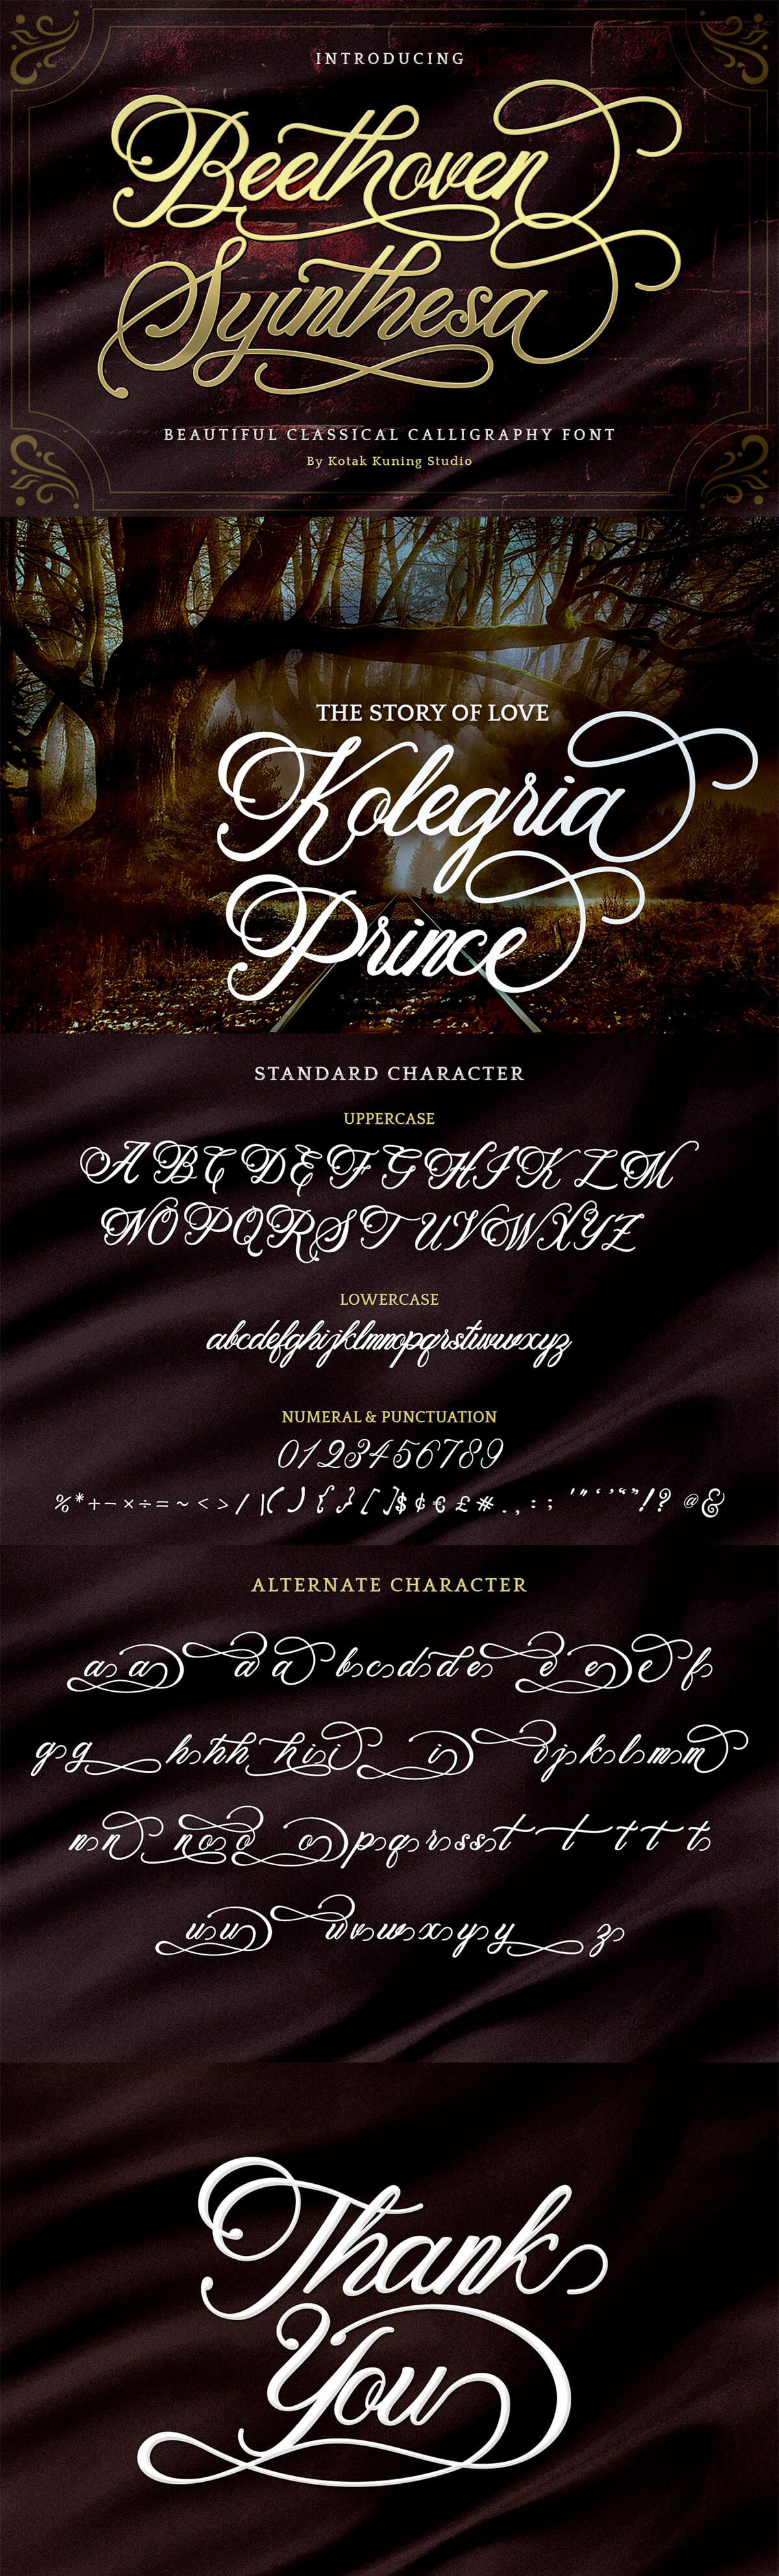 Free Beethoven Syinthesa Calligraphy Font